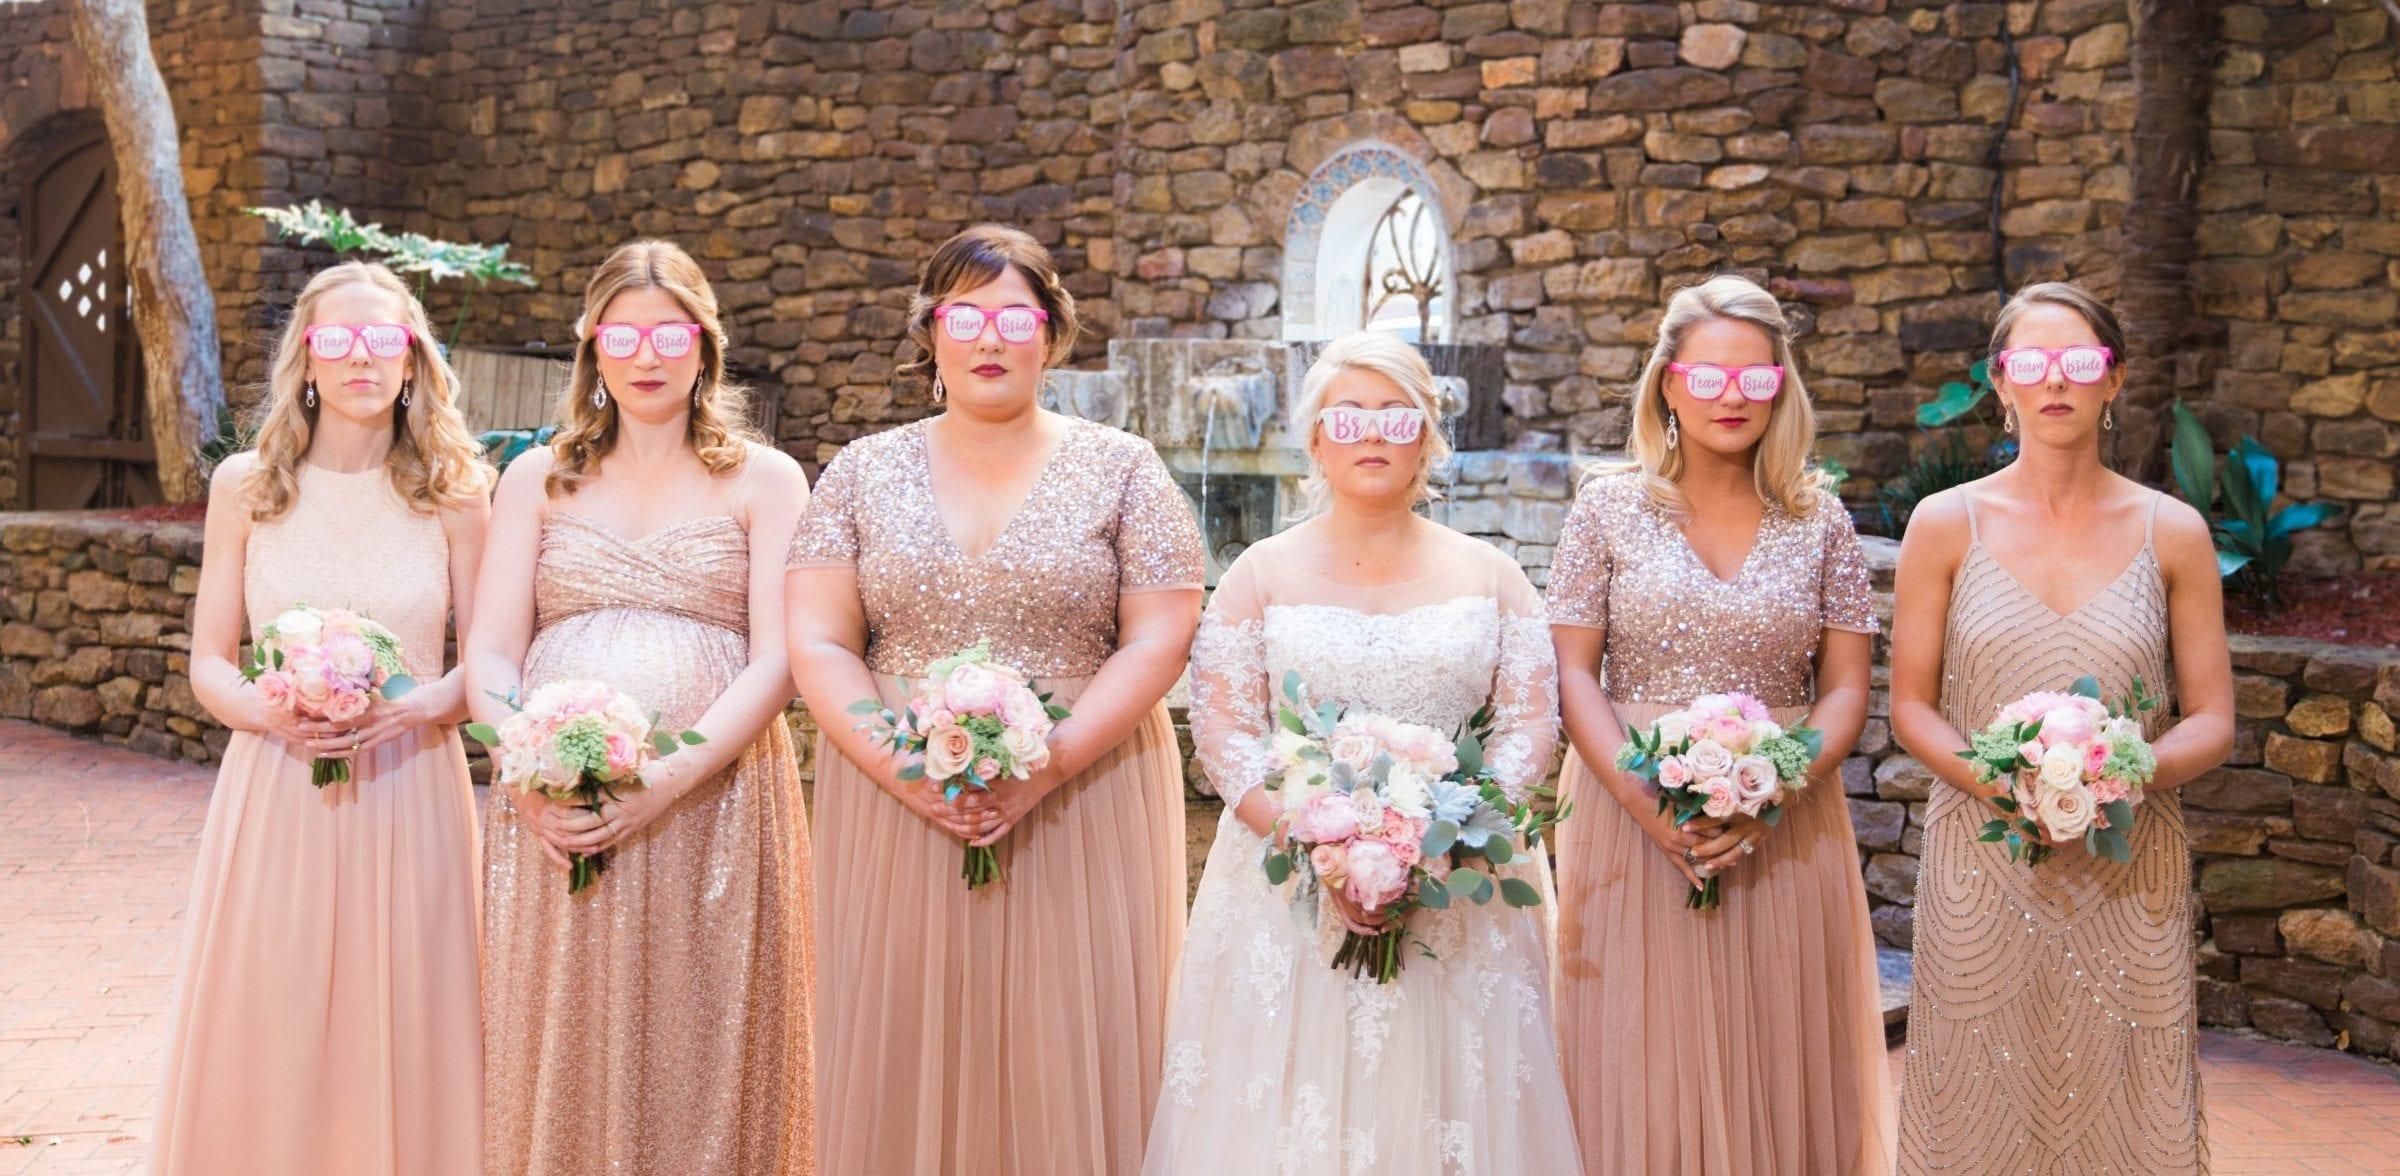 Crawford wedding Omni Del Mansion riverwalk bridesmaids serious